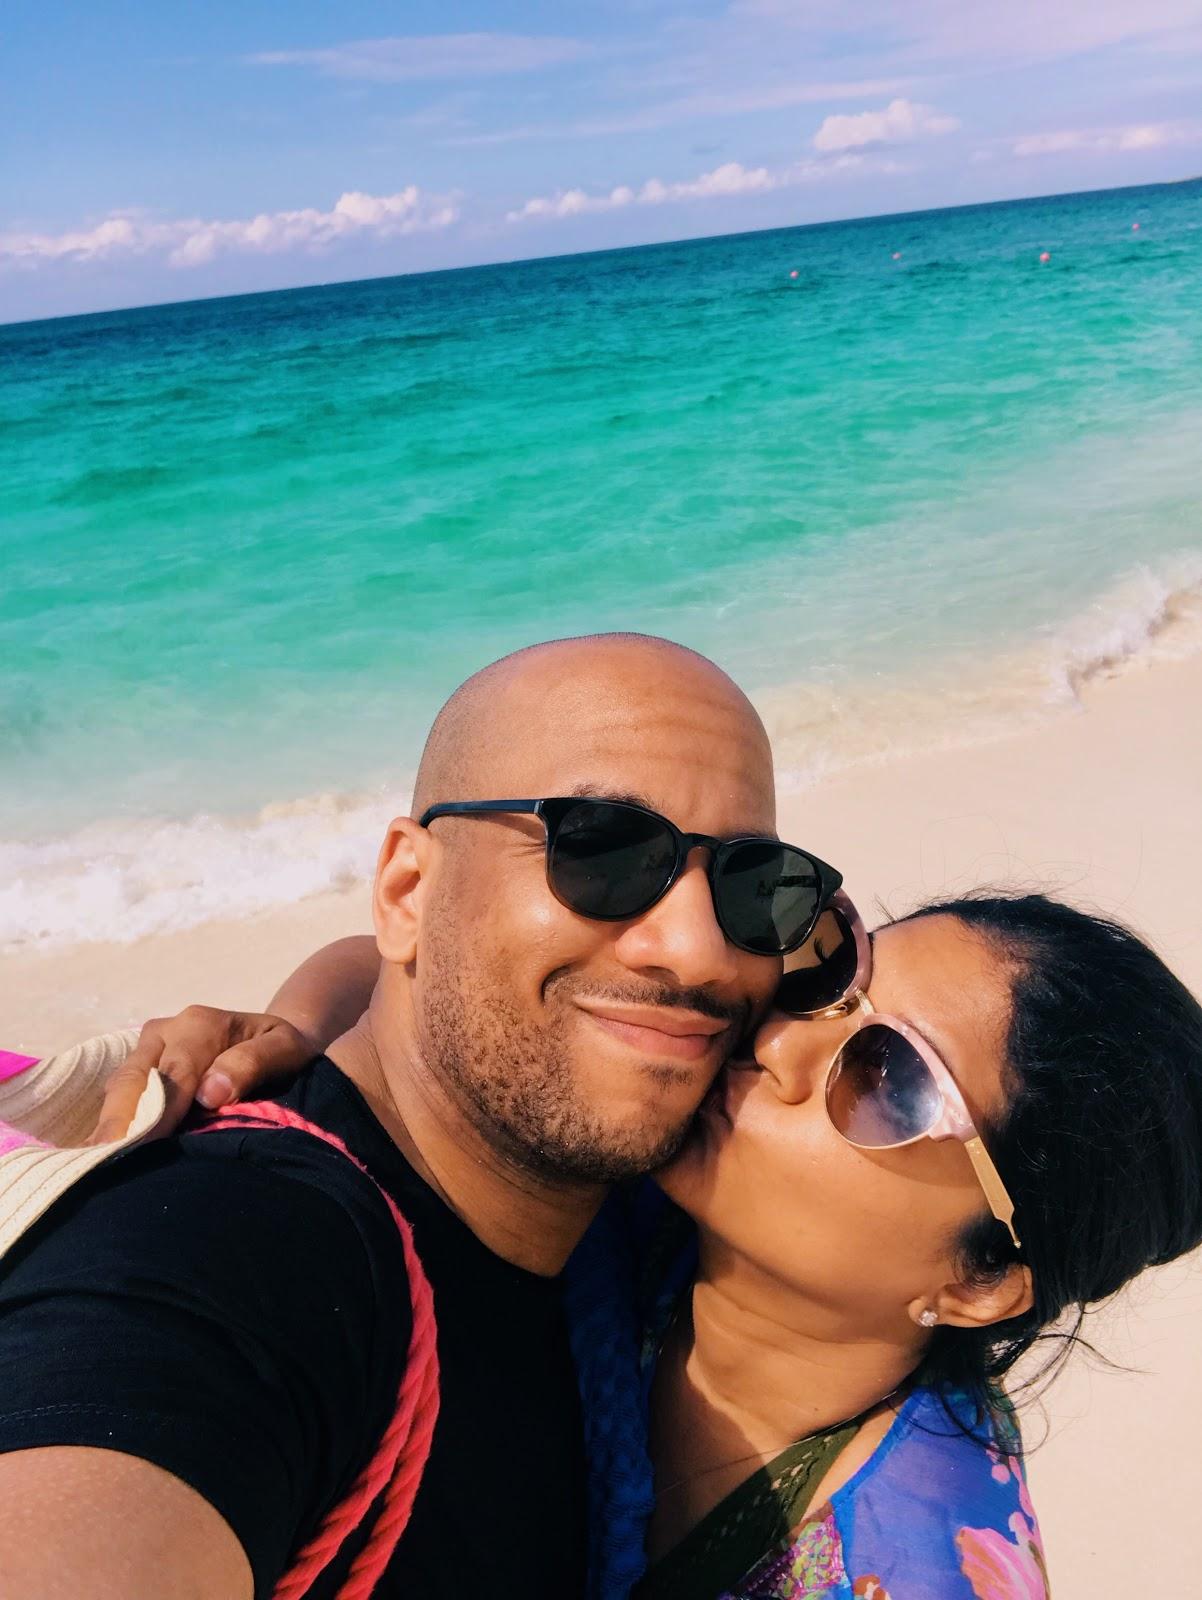 Weekend beach getaway without the kids bahamas weekend